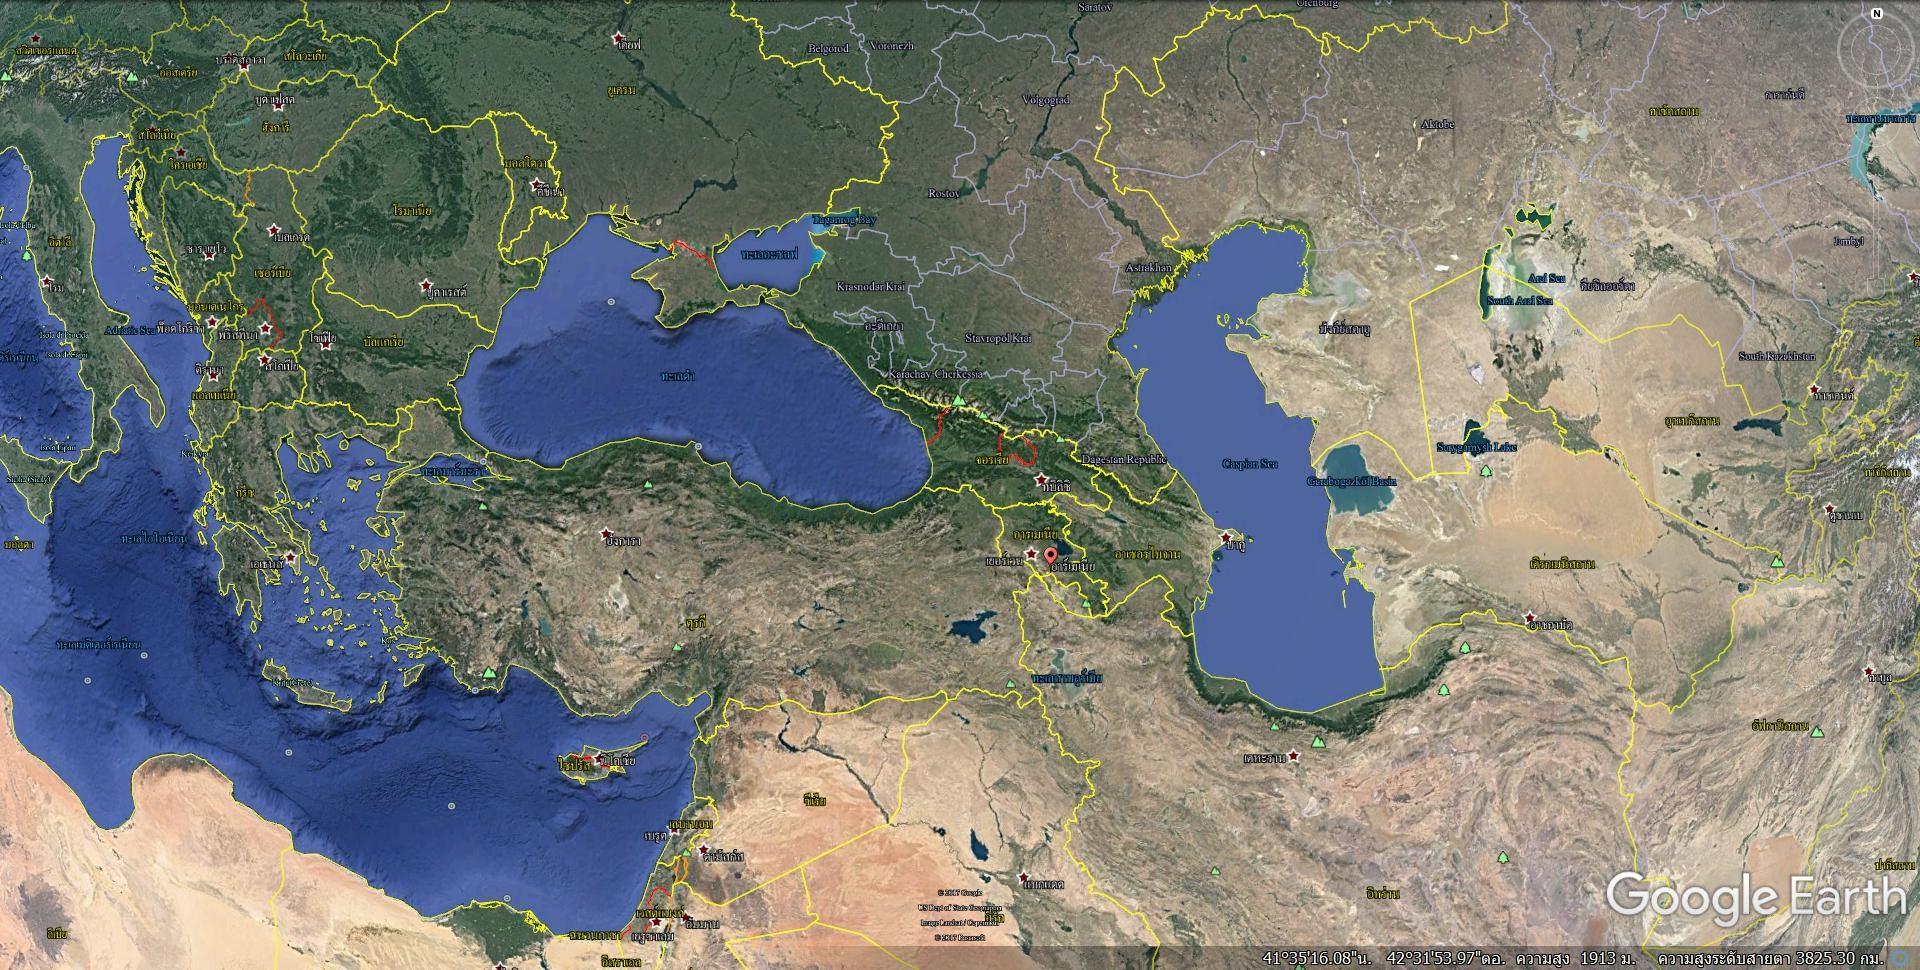 Google earth asia august 4 2017 httpsgoomapsencxgojpvcn armenia httpsearth googleweb40070618545040741279959670852a5692740647145d35y0h0t gumiabroncs Gallery